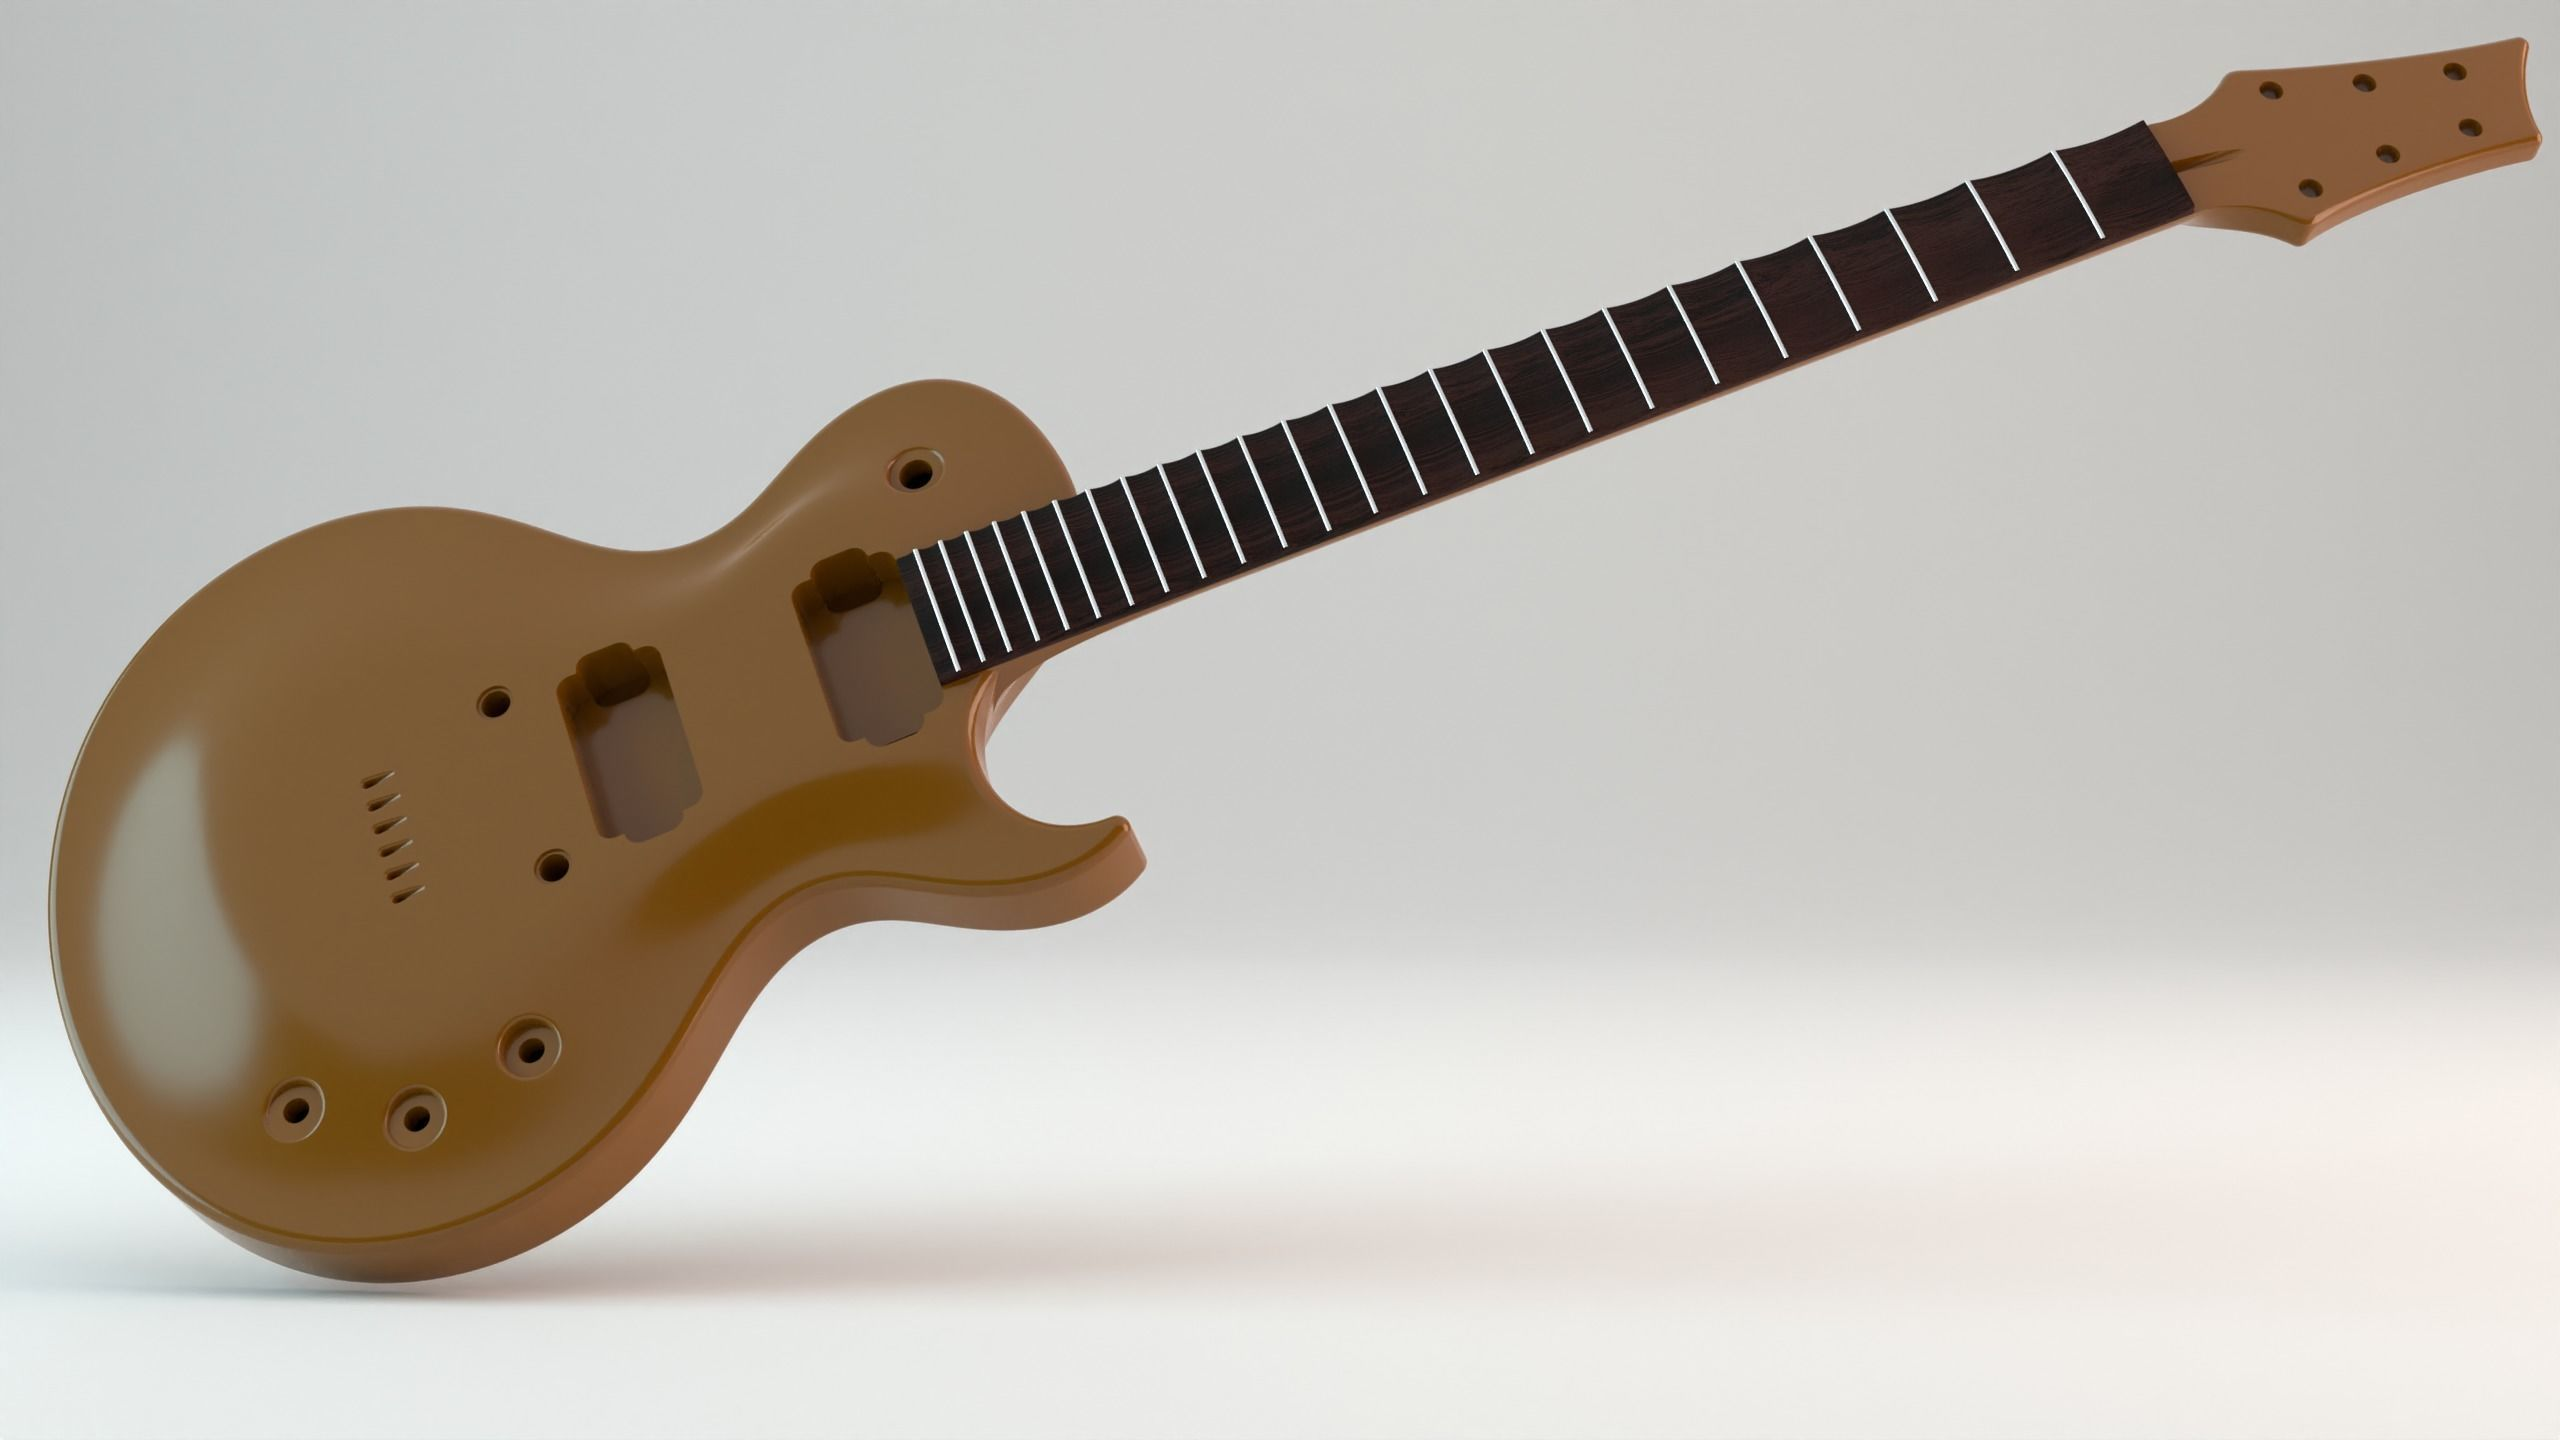 CNC Ready Les Paul Style Guitar Single Cut